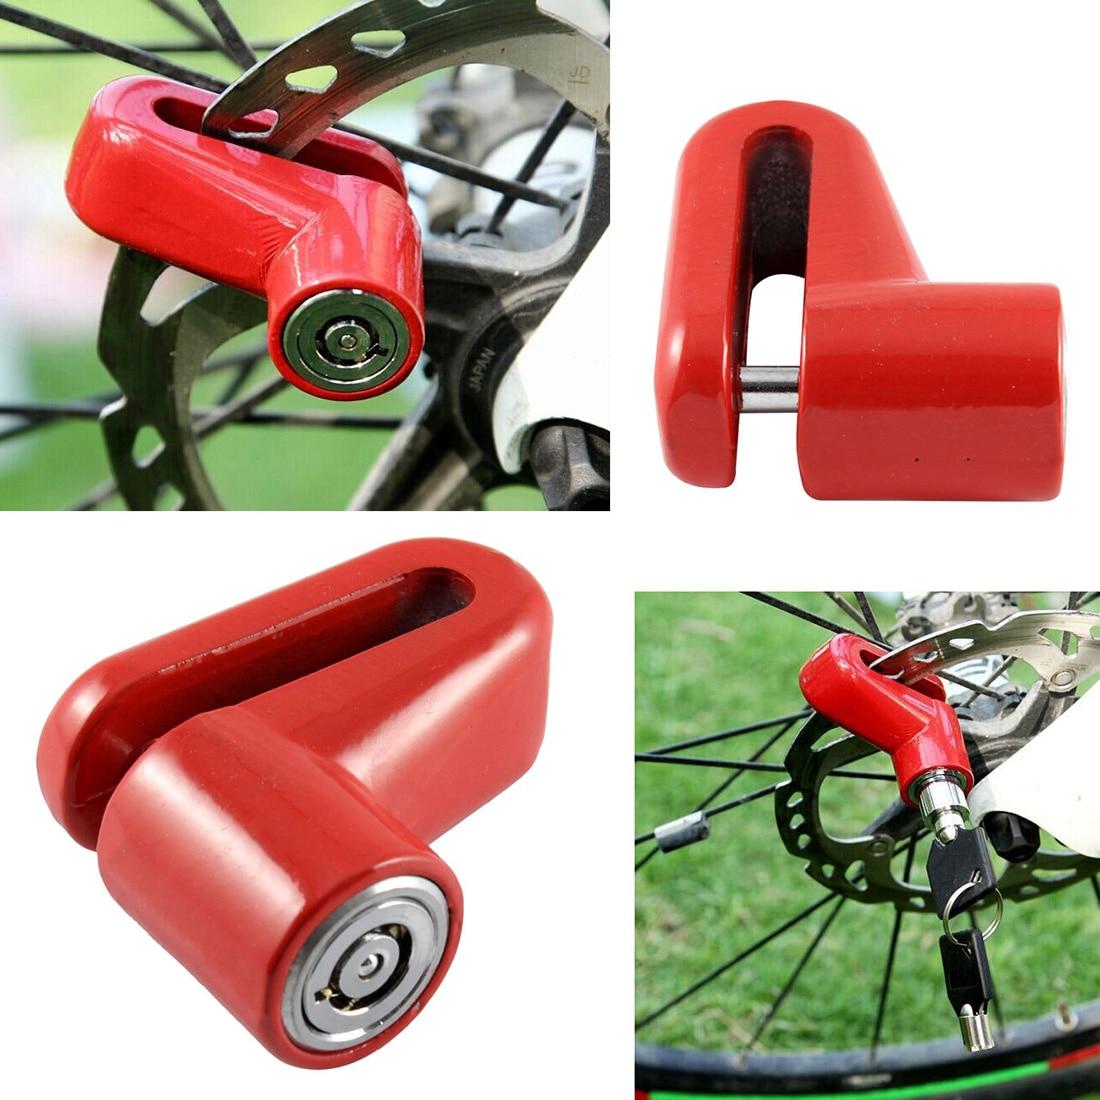 CAR-partment Good Quality Motorcycle Bicycle Sturdy Wheel Disc Brake Lock Security Anti Thief Alarm Disk Disc Brake Rotor Lock